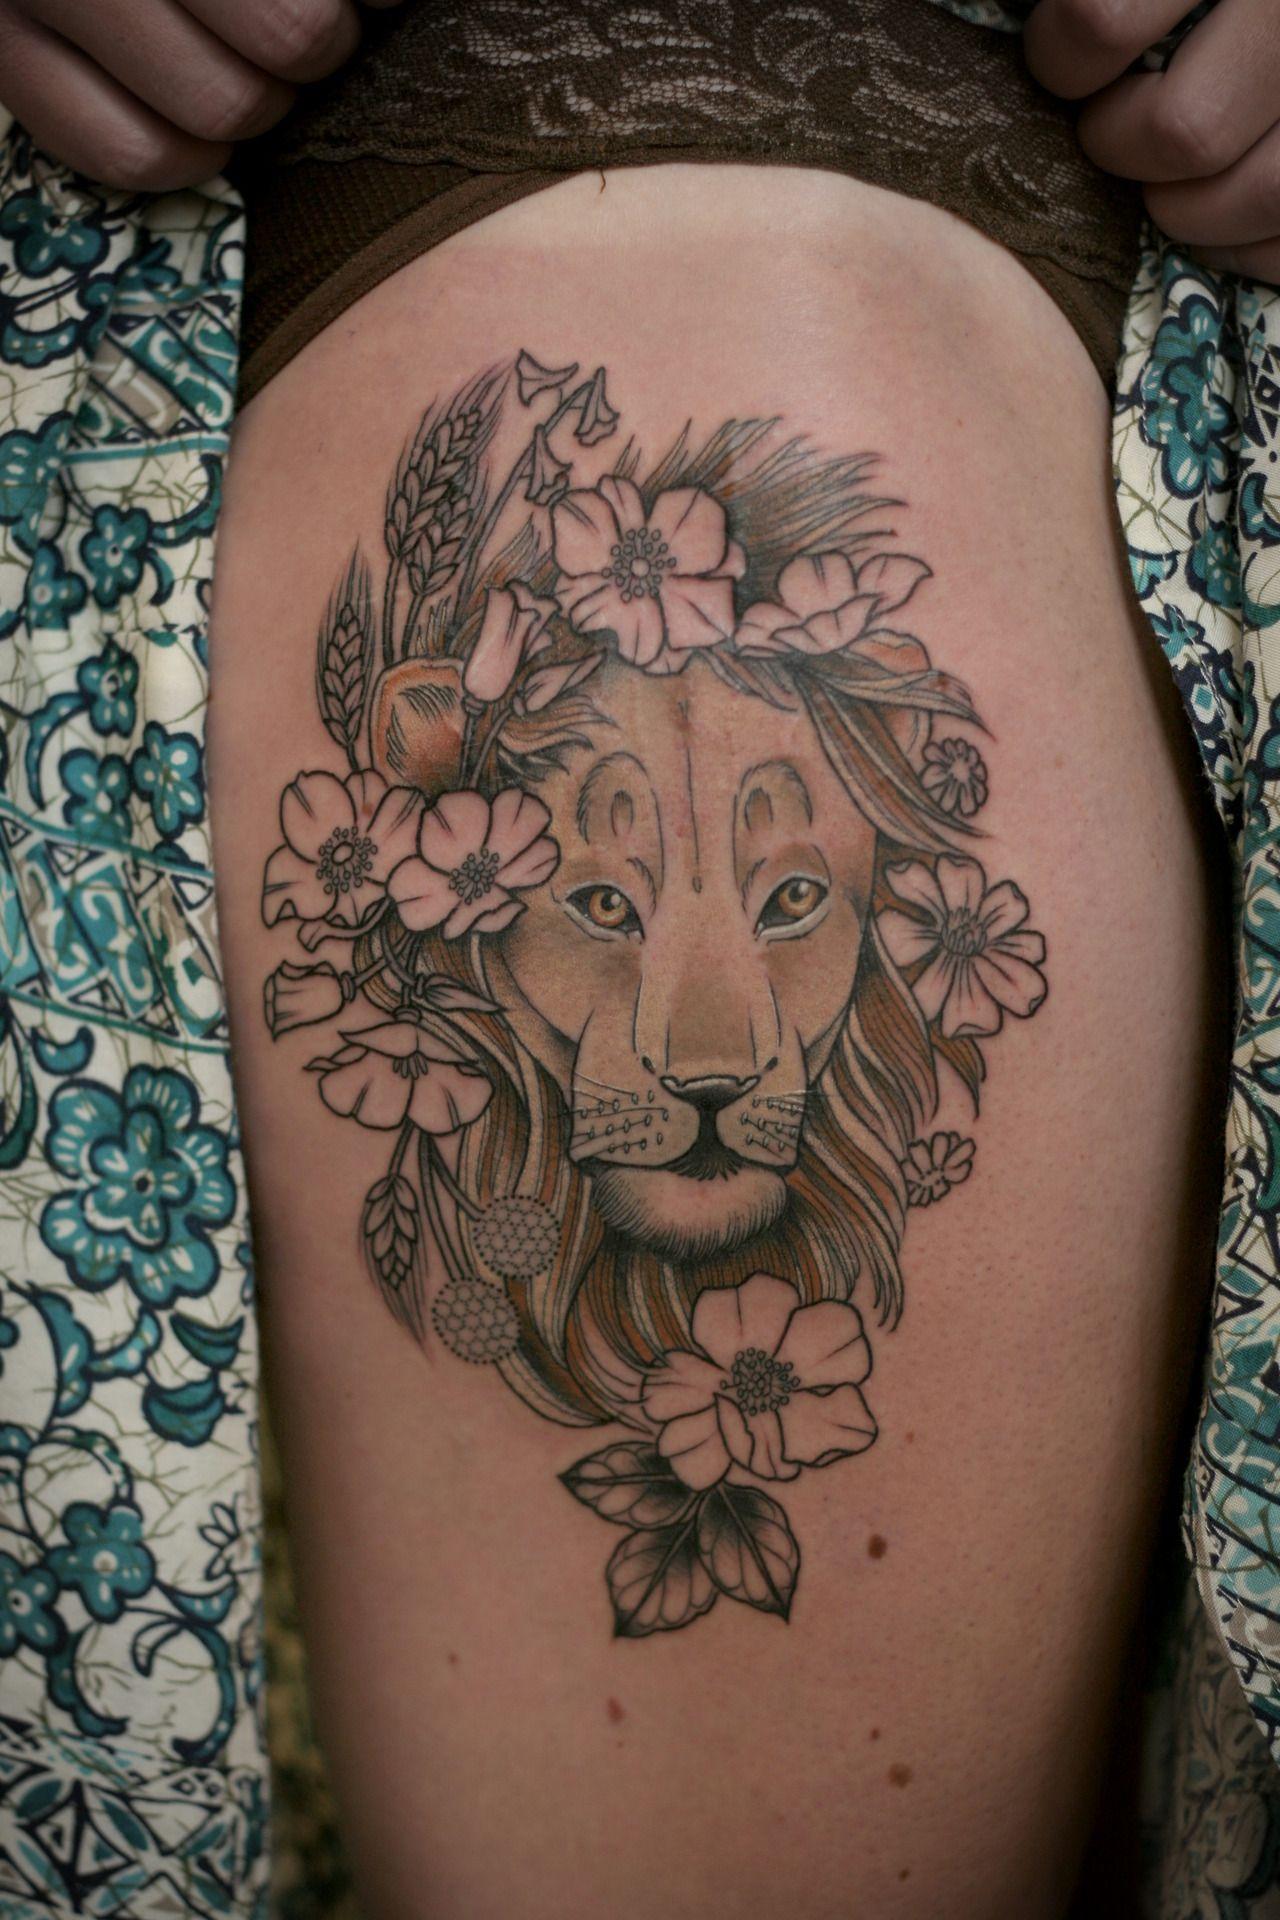 Wonderland Tattoos Kirsten Holliday like the placement